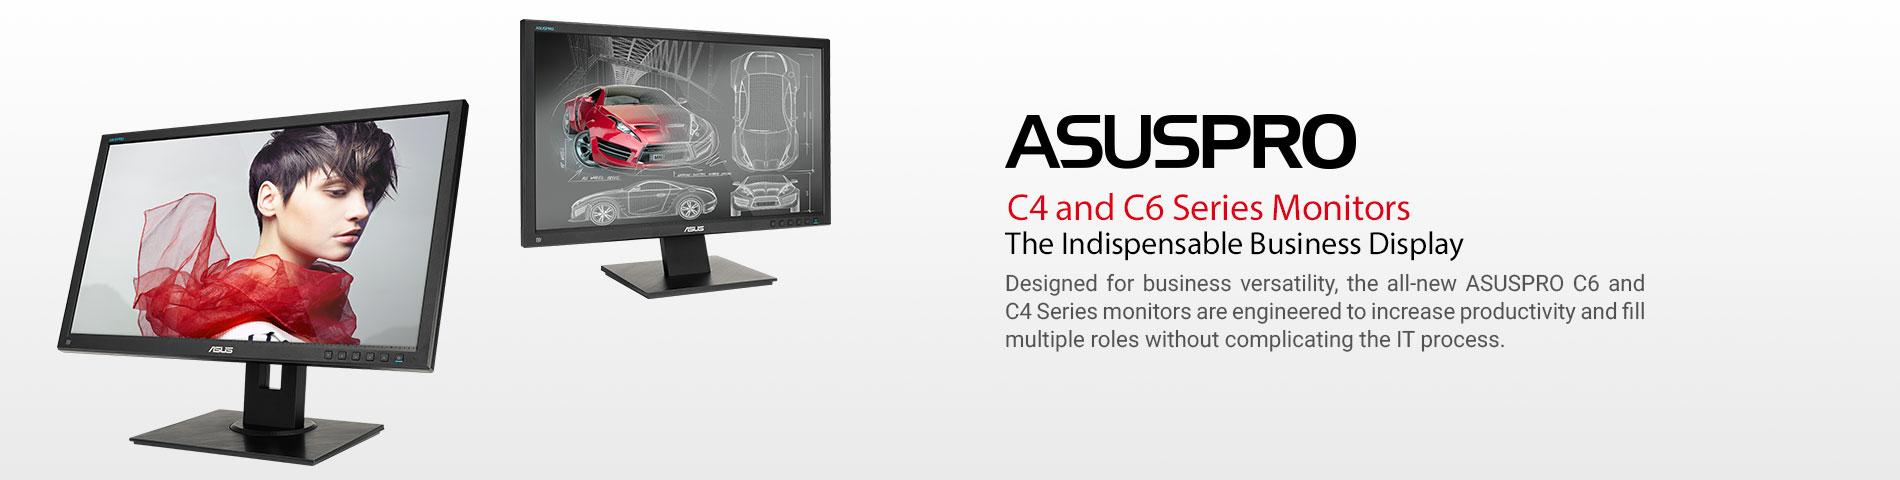 Asus C4 & C6 Monitors